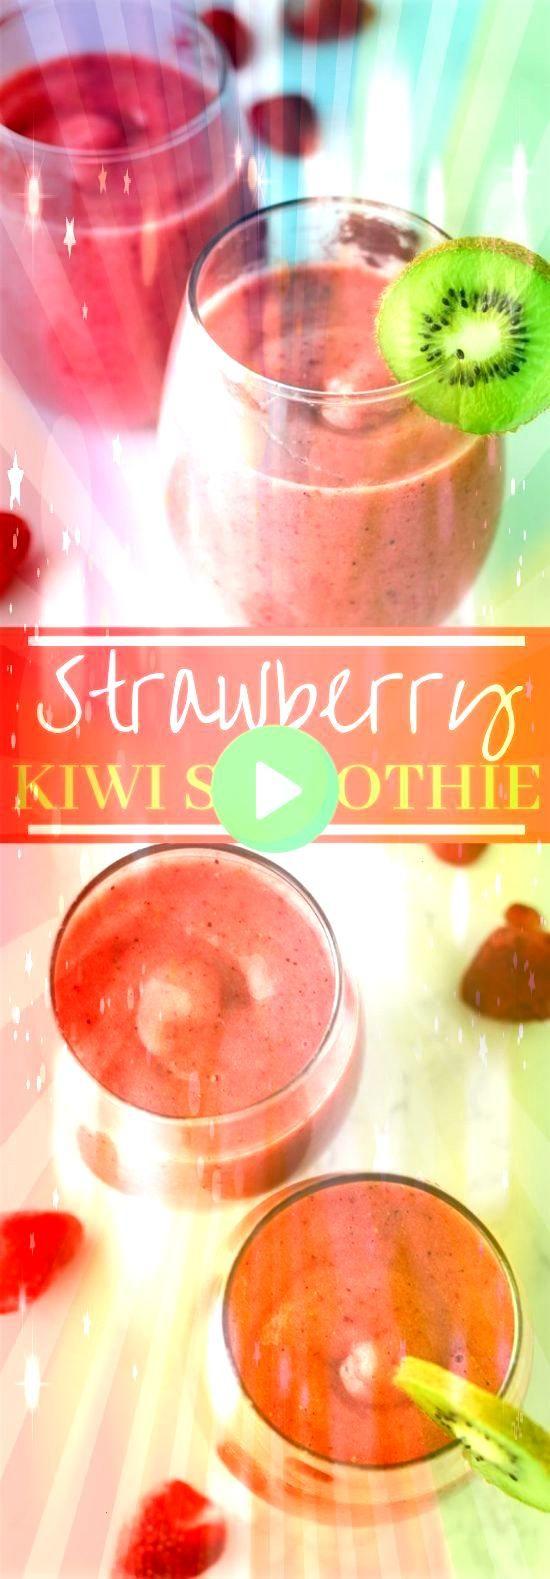 #Erdbeere #Smoothies #Smoothie #Getränke #Strawberry Kiwi SmoothieStrawberry …   – drinks